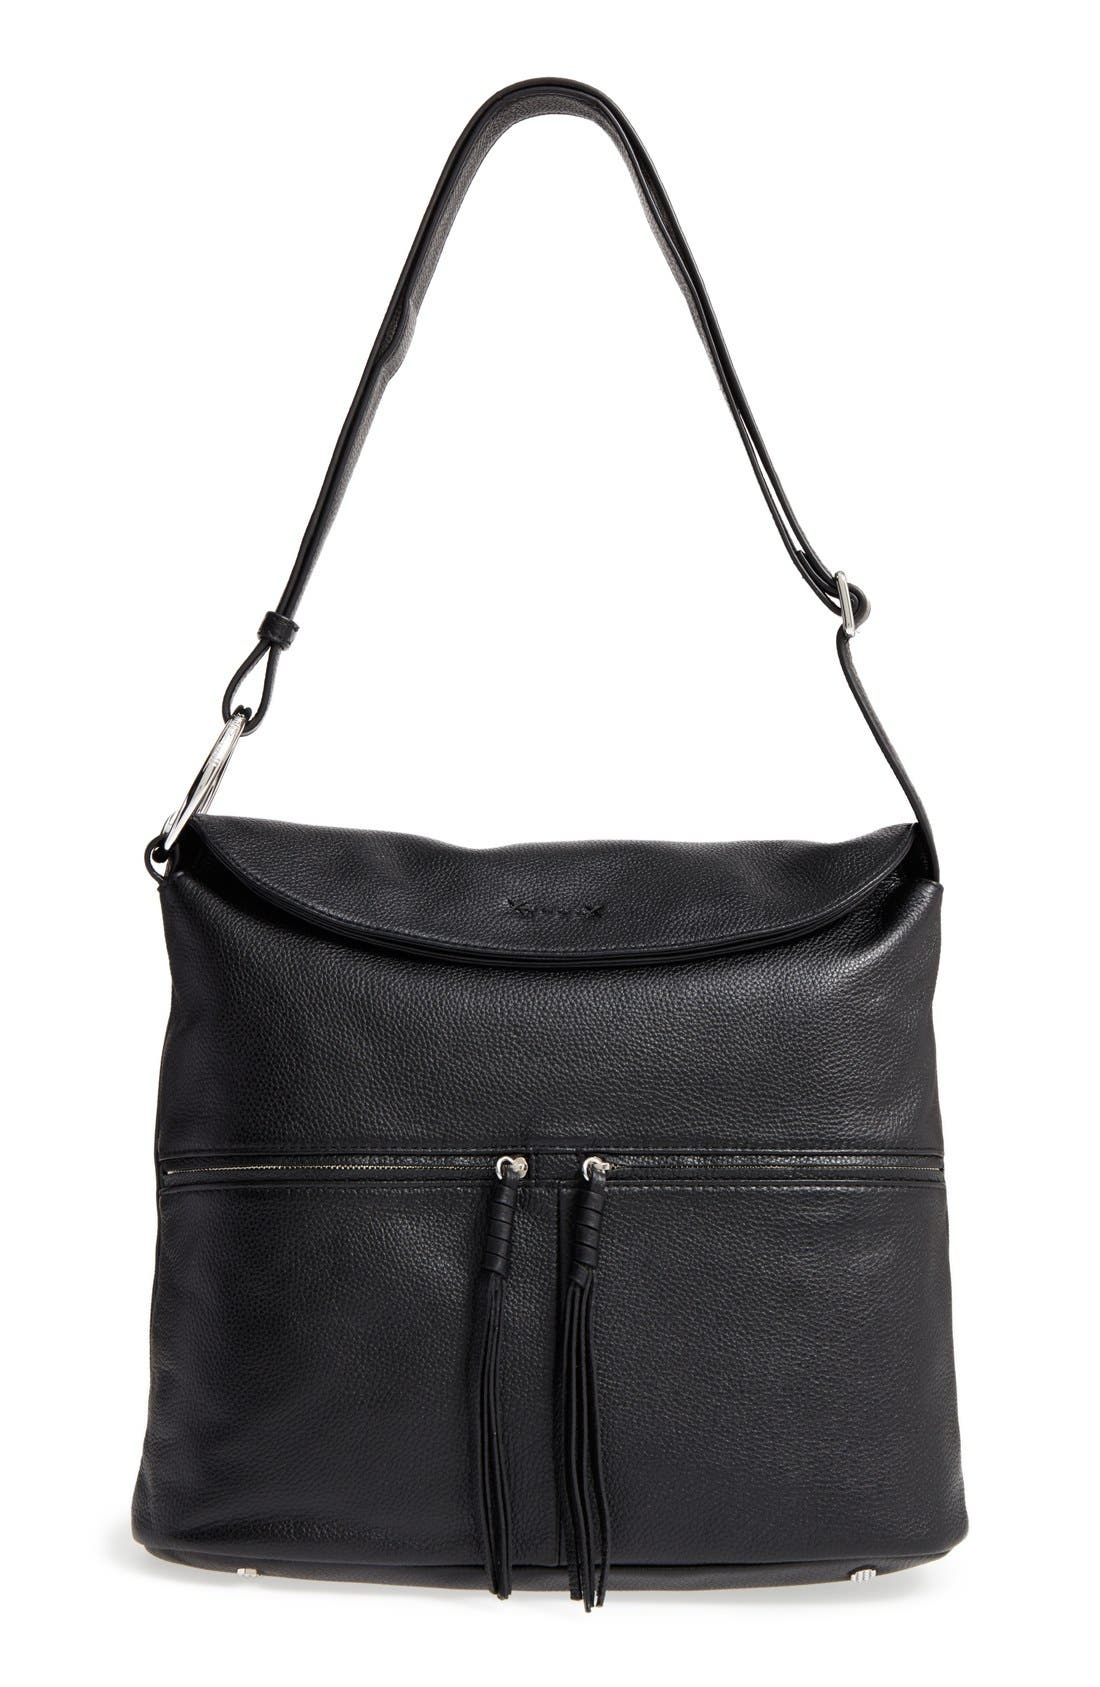 Elizabeth and James Finley Leather Hobo Bag